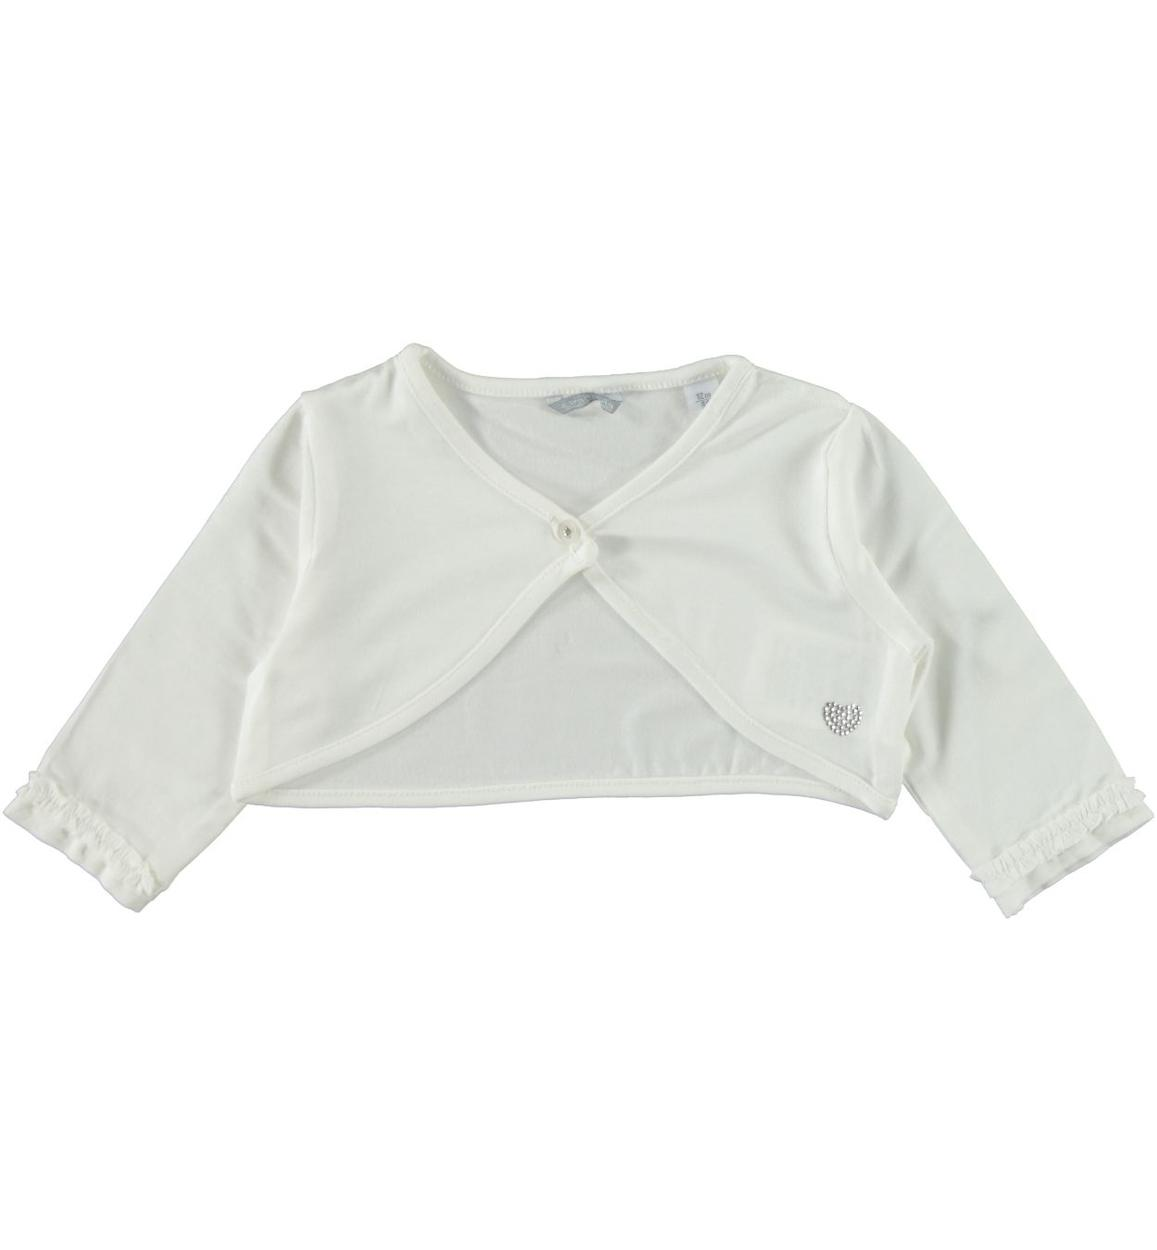 best service 4a56a 56cfd Grazioso coprispalle in jersey di viscosa con manica 3/4 per bambina da 6  mesi a 7 anni Sarabanda